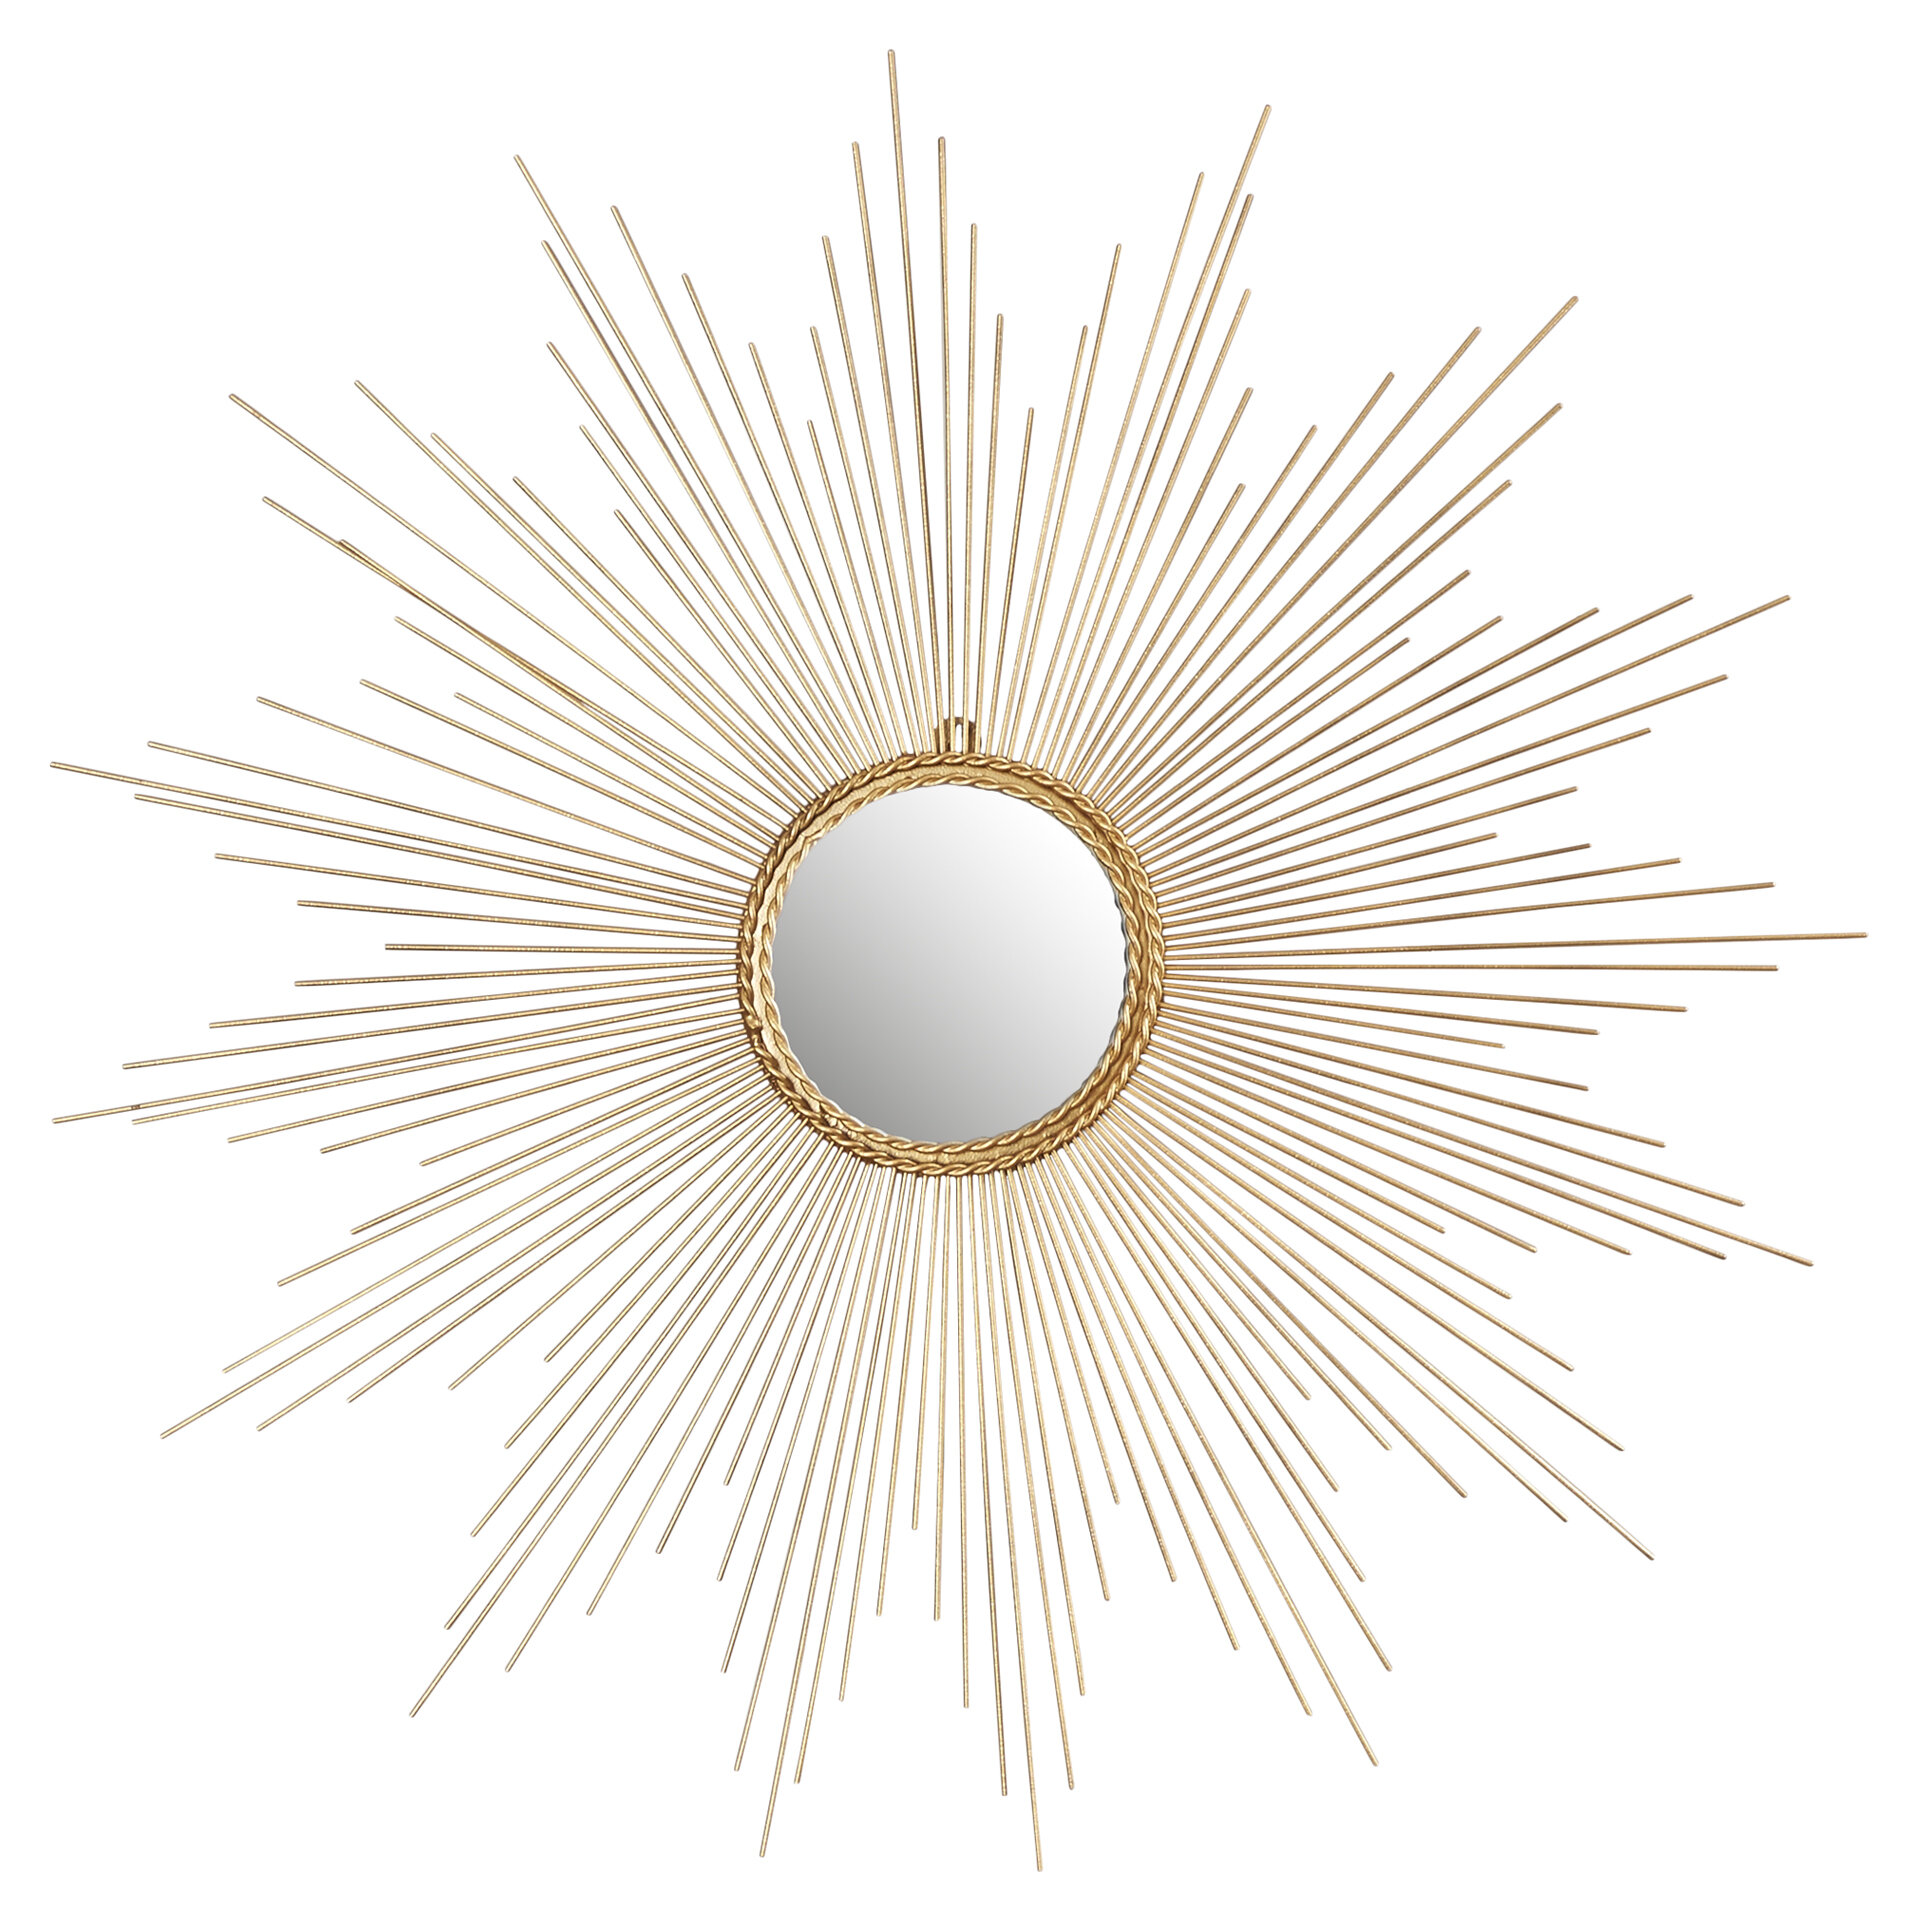 Large Oversized Sunburst Wall Mirrors You Ll Love In 2020 Wayfair